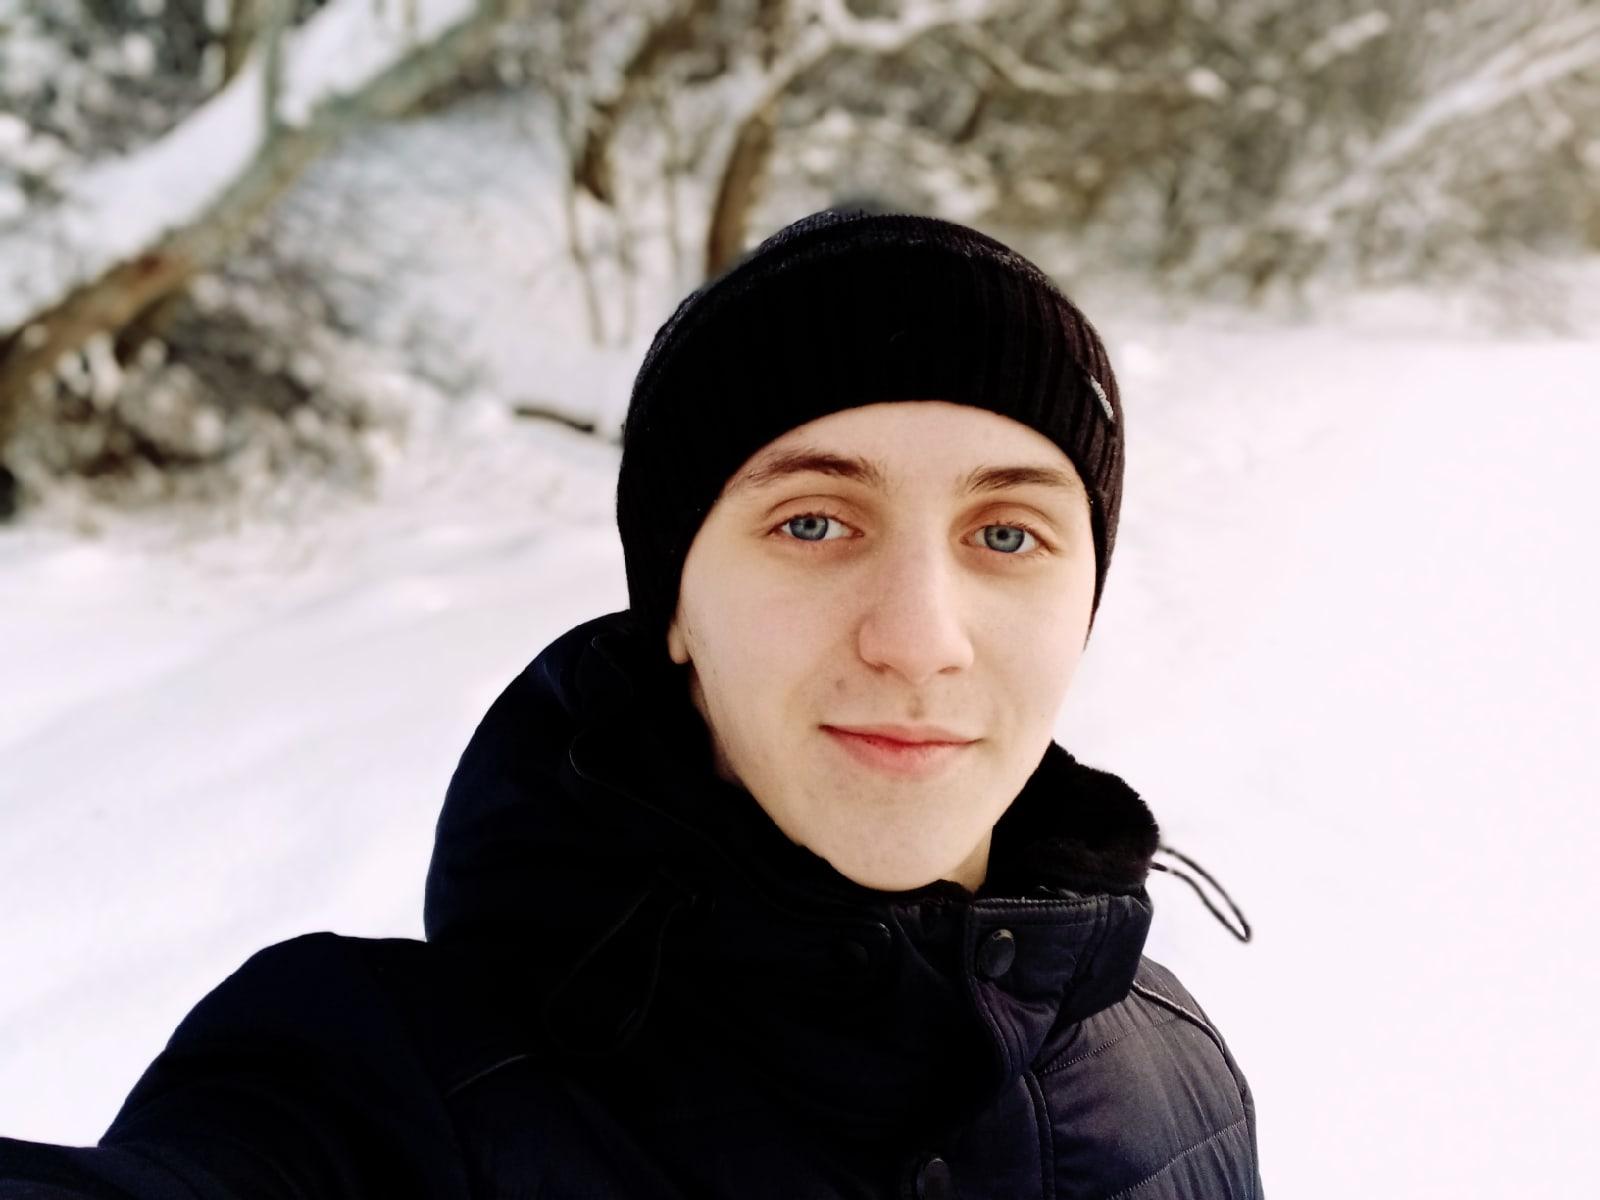 видео Четыре цвета глаз